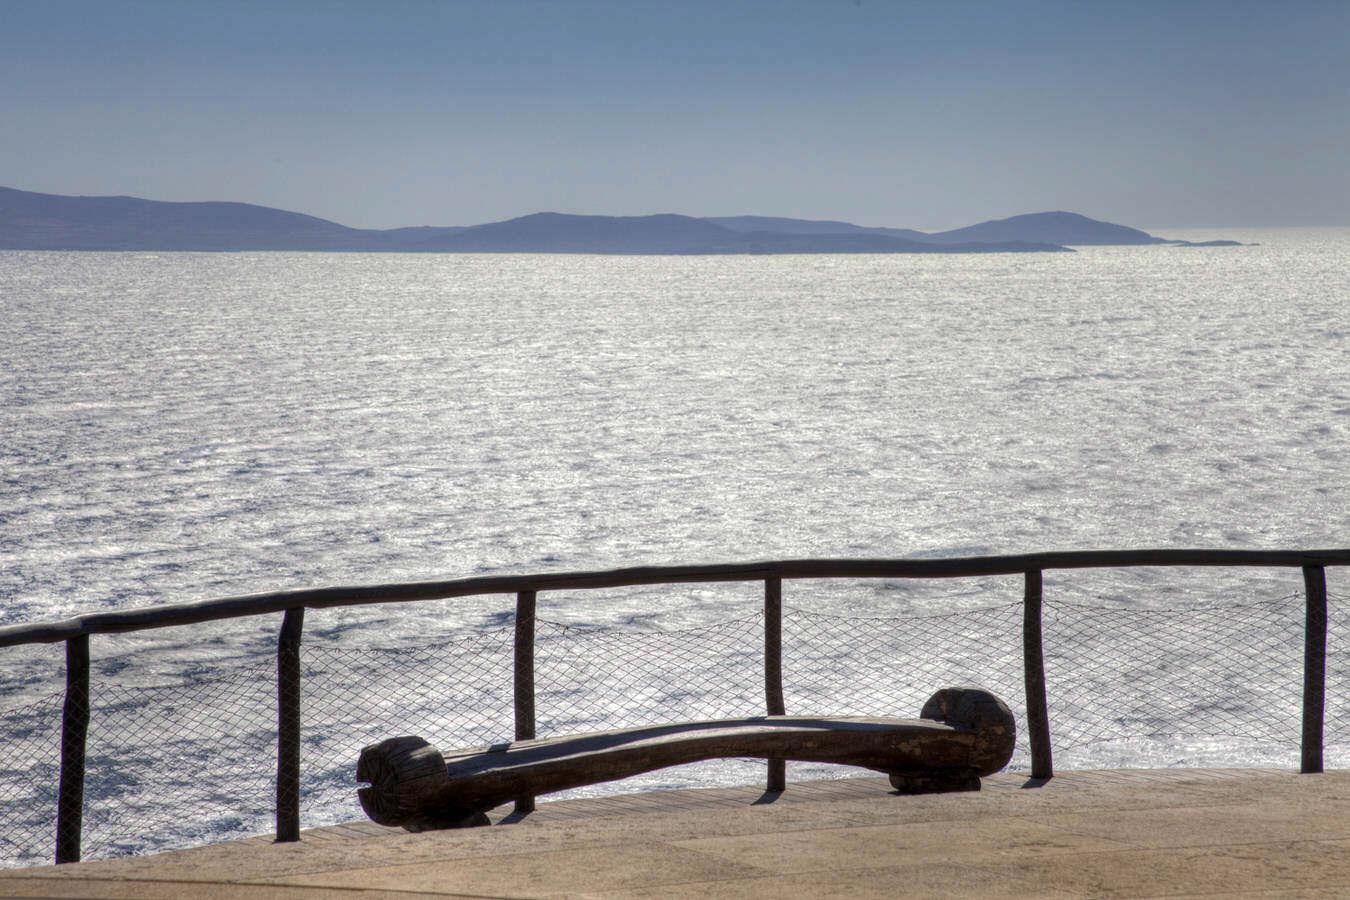 ALIGNED WITH NATURE, MYKONOS, Γιώργος Φάκαρος - Αρχιτεκτονική Φωτογραφία | Εσωτερικοί Χώροι | Φωτογραφία Ξενοδοχειών - Photography / Φωτογραφία